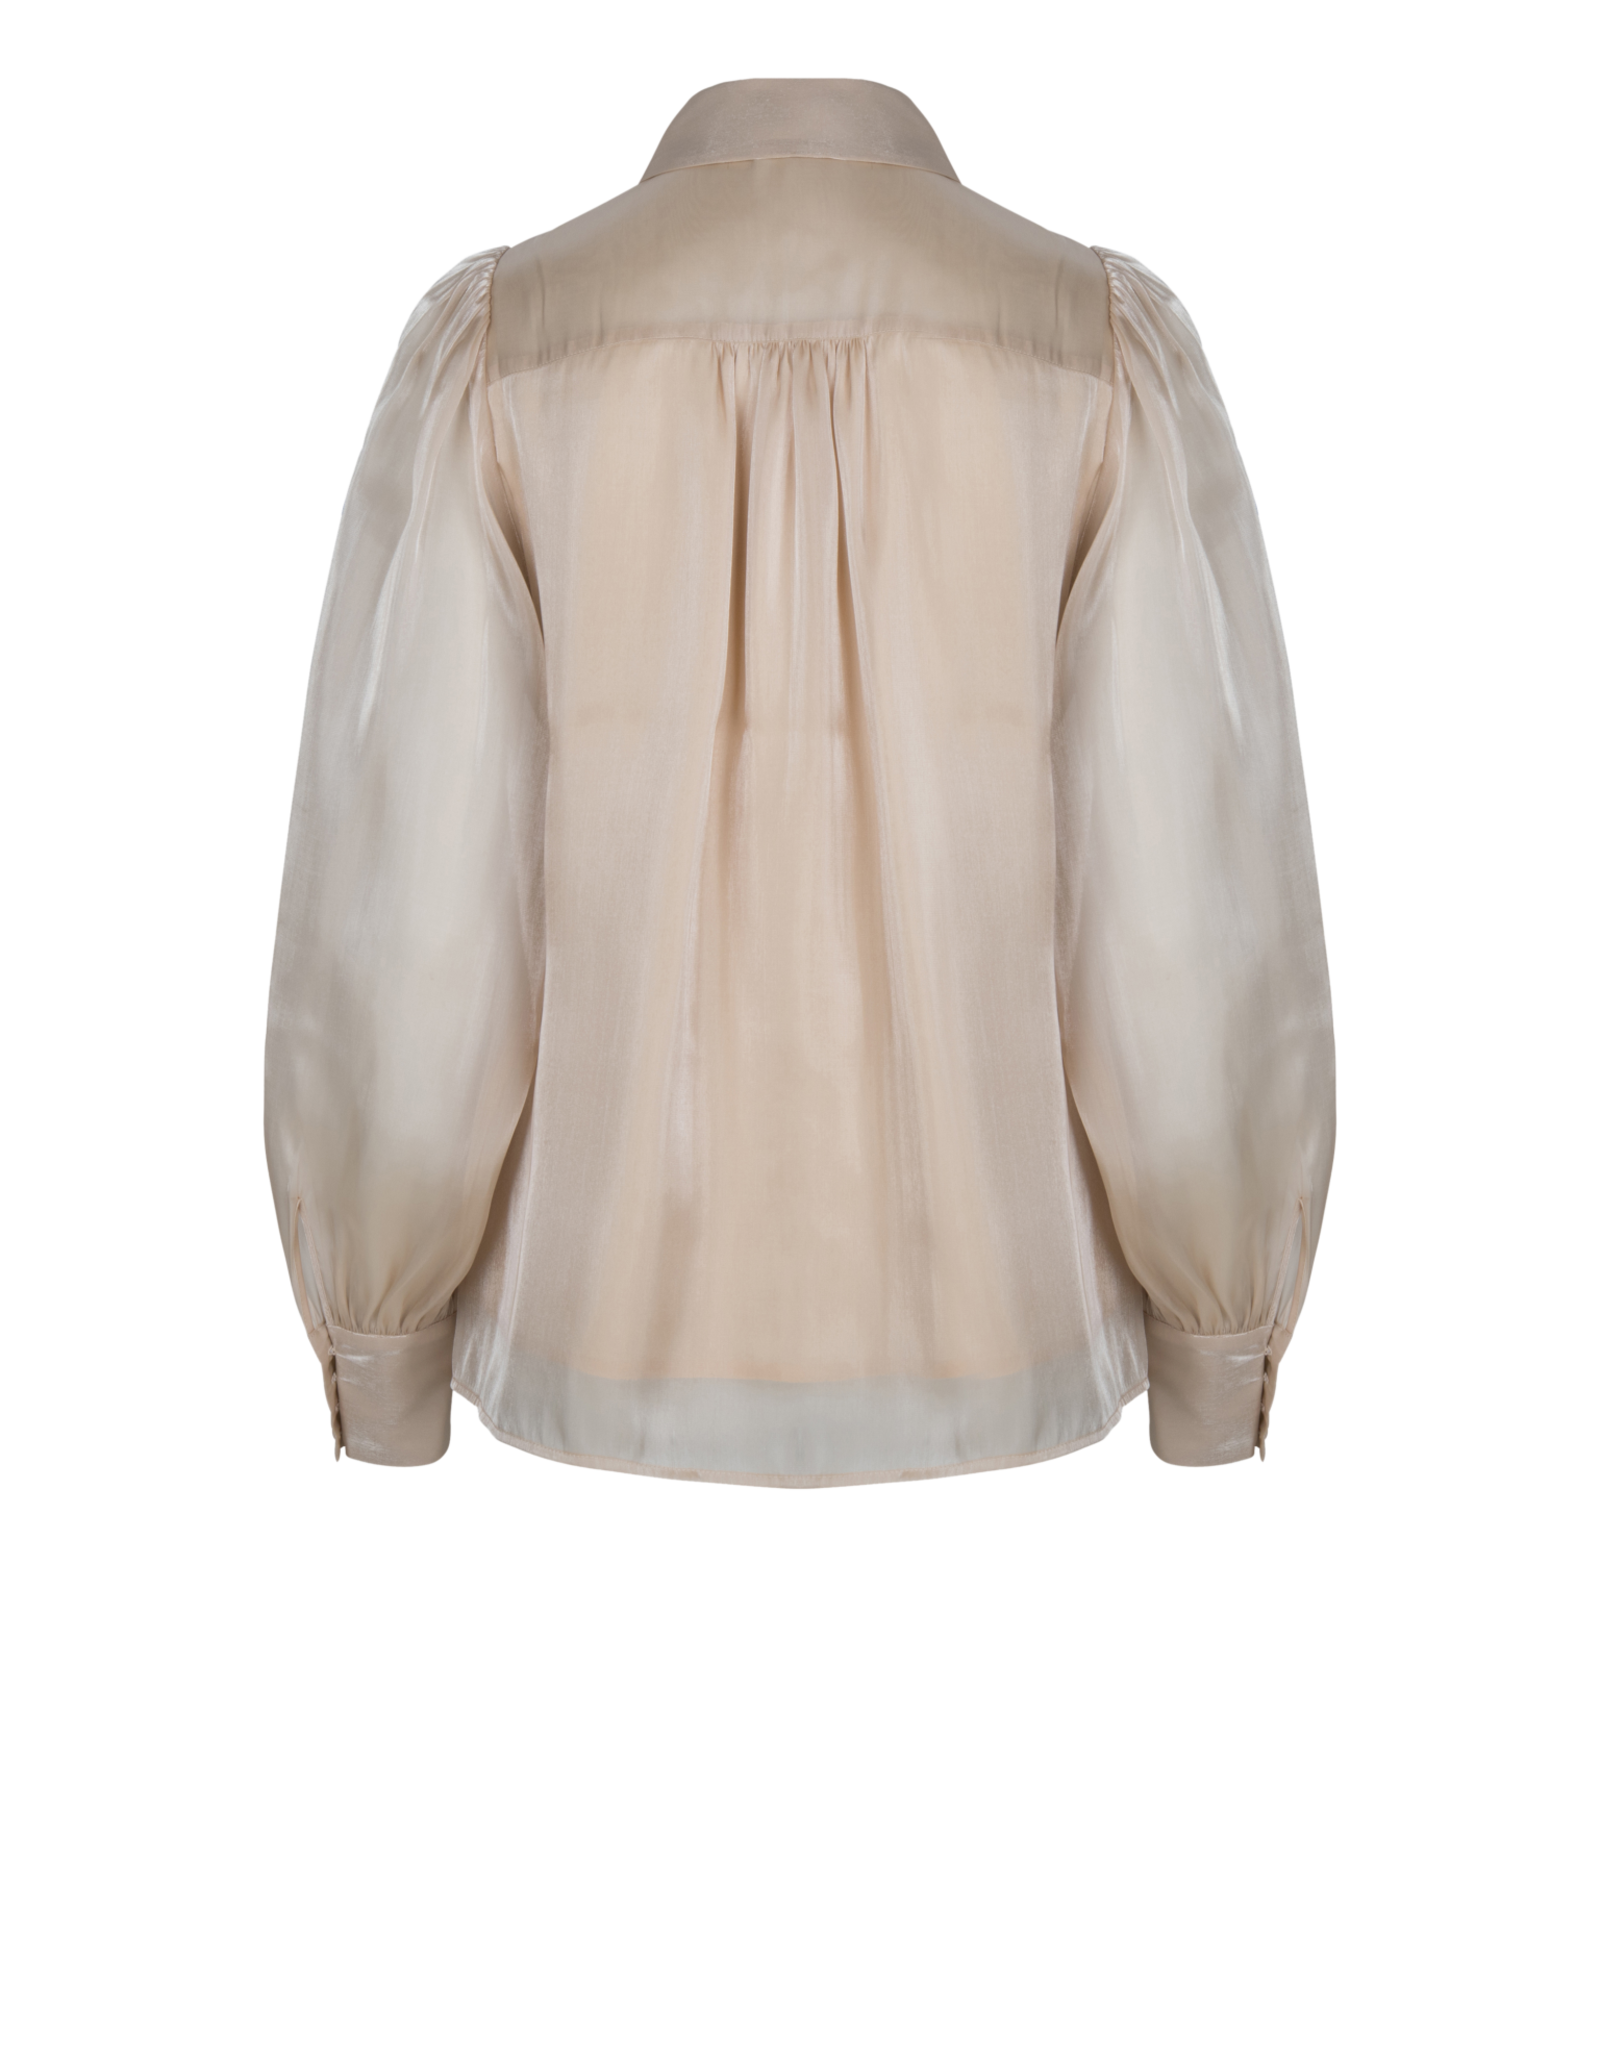 Dante6 Mauri organza blouse